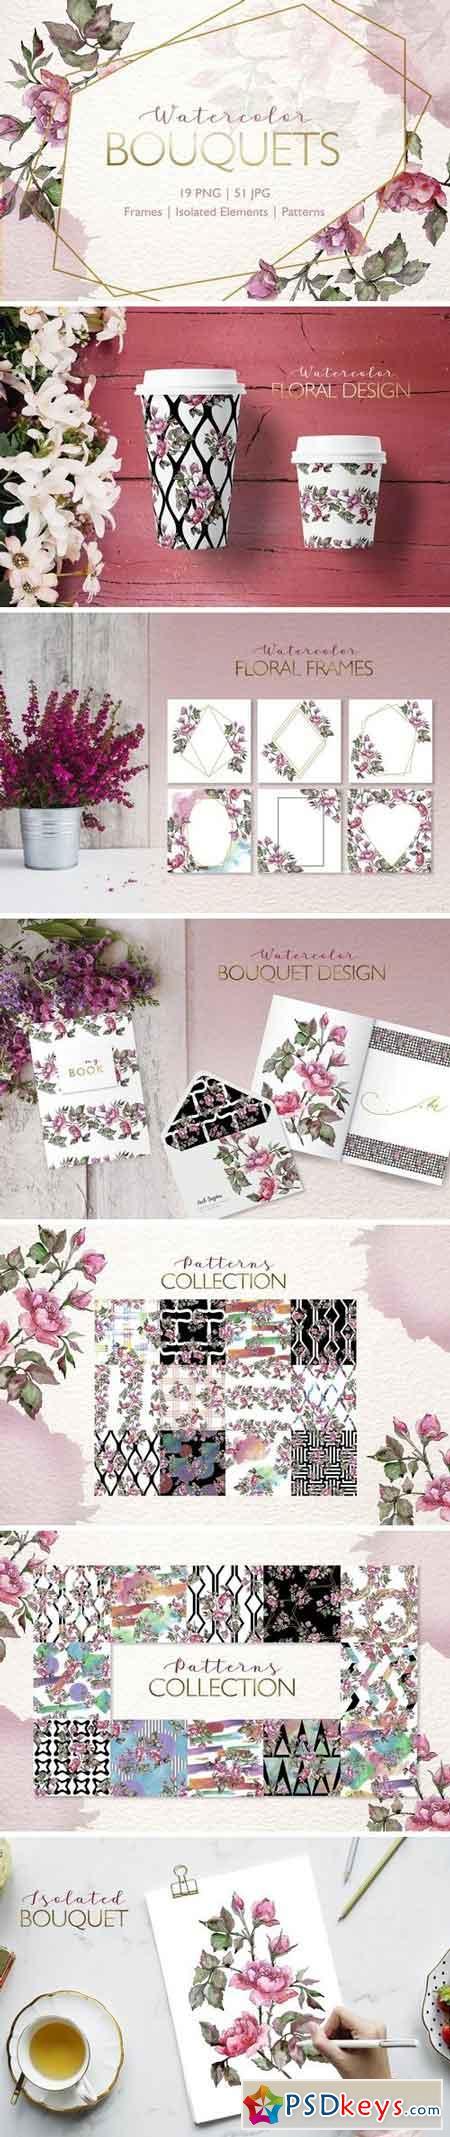 Bouquets Watercolor png 3307805